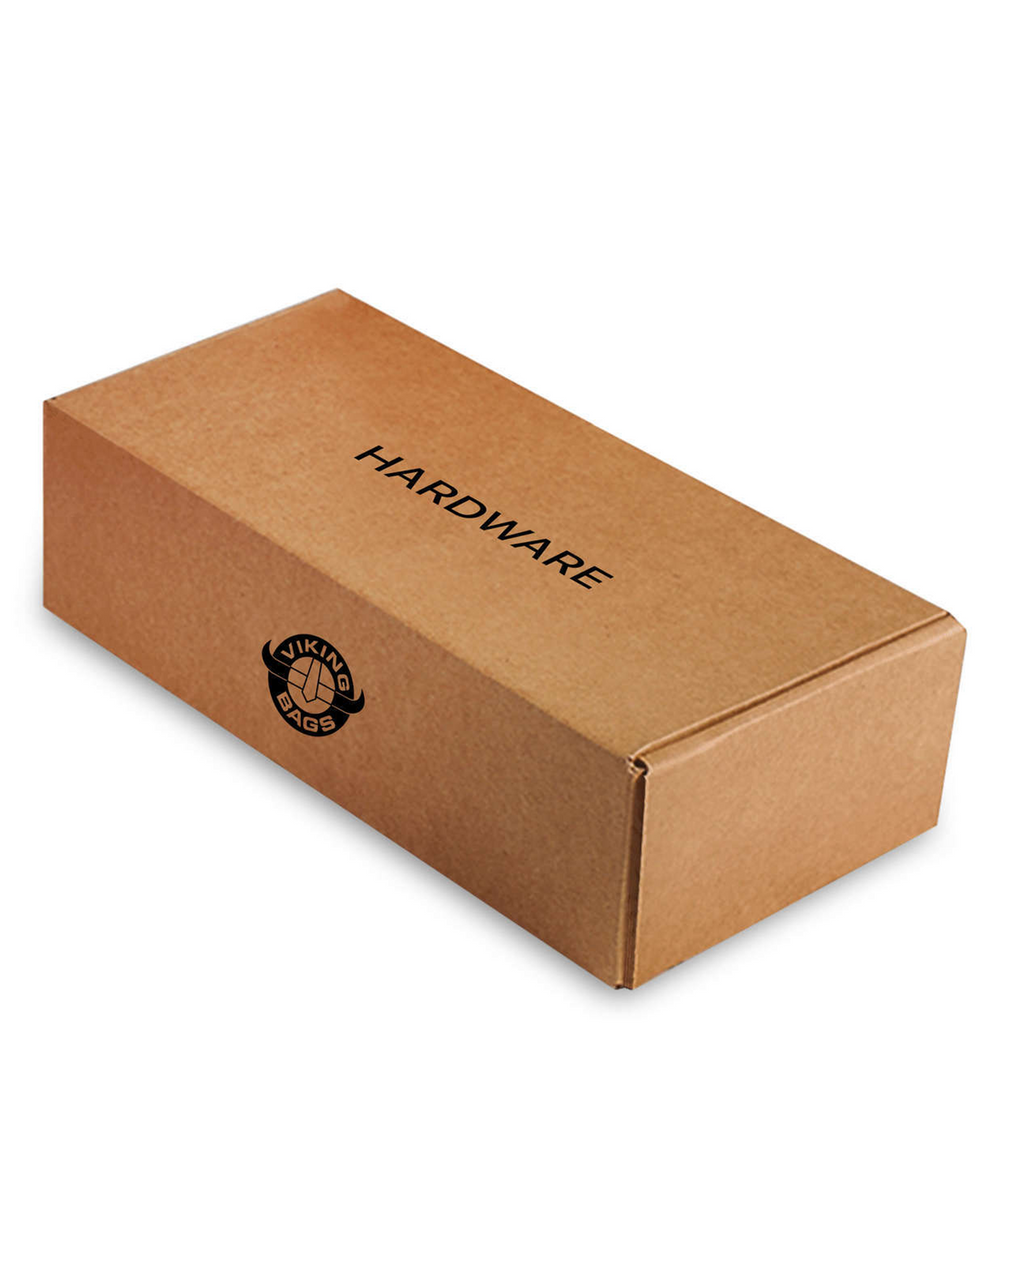 Honda VTX 1800 R Slanted Studded L Motorcycle Saddlebags Hardware Box